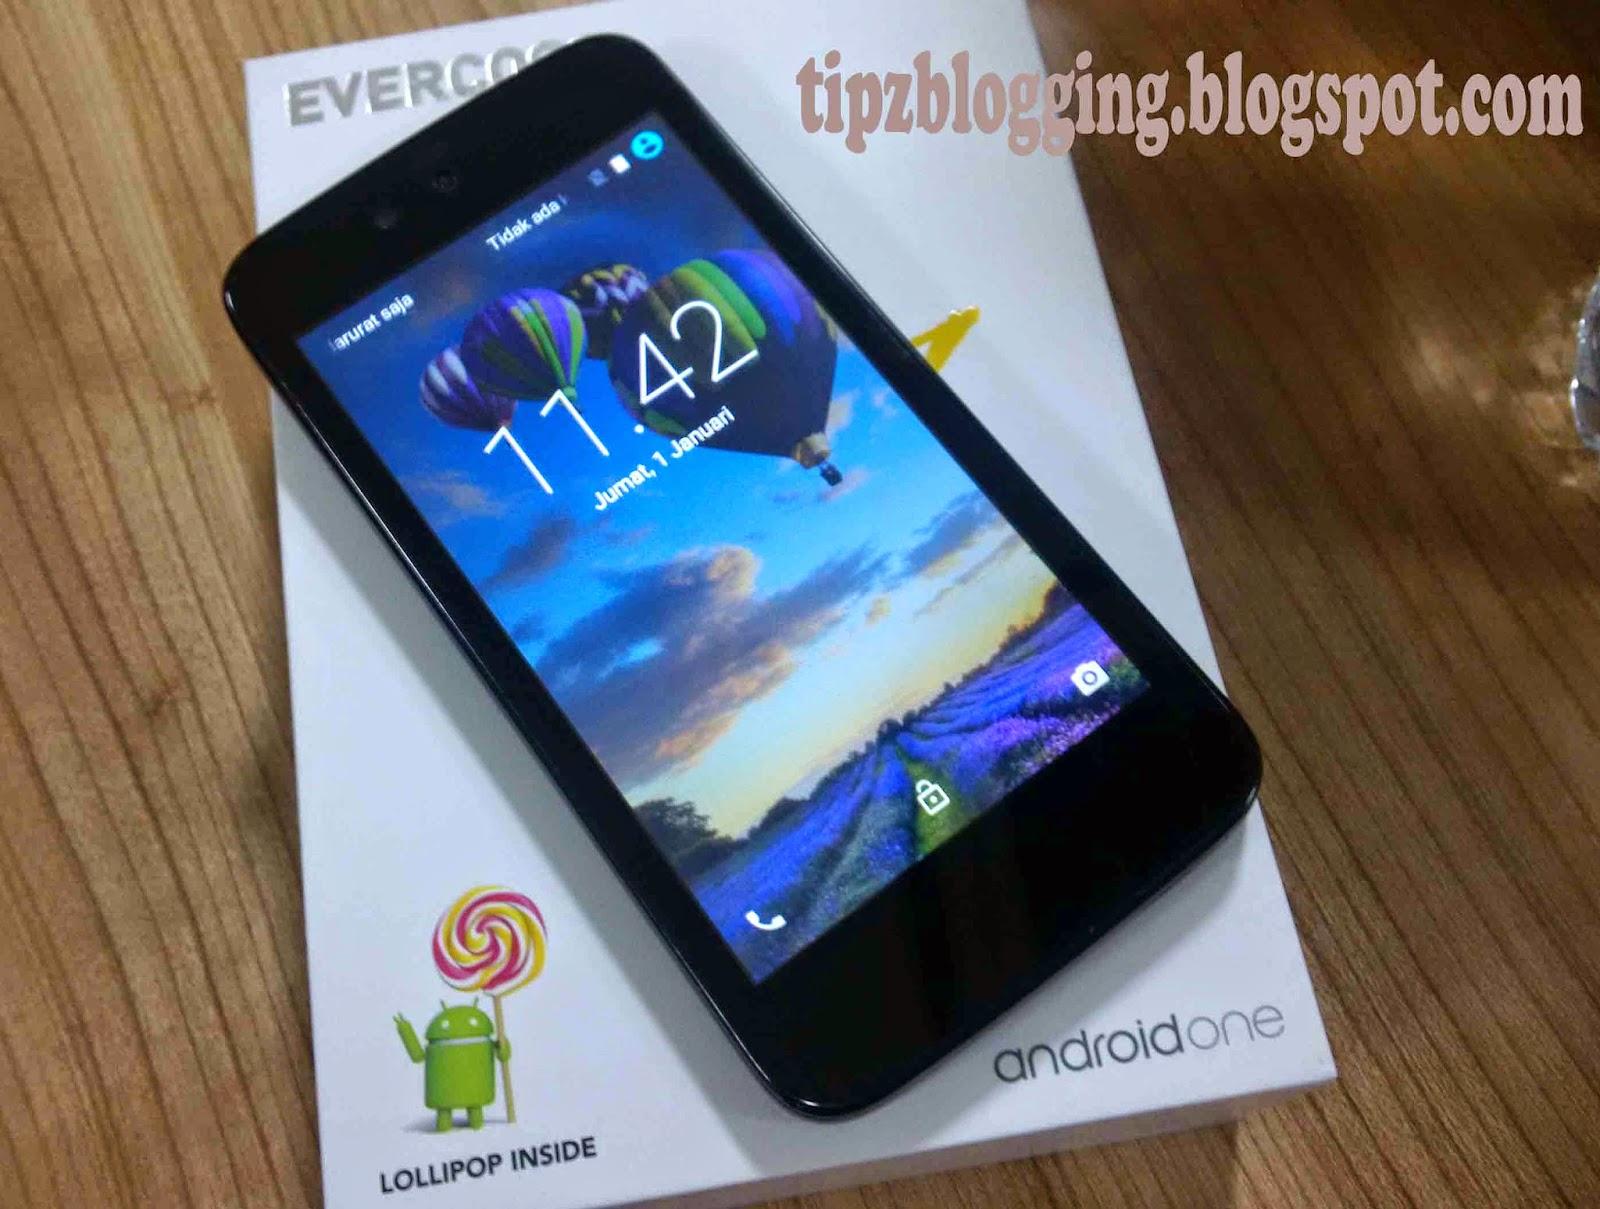 Harga HP Evercoss One X Android One Terbaru